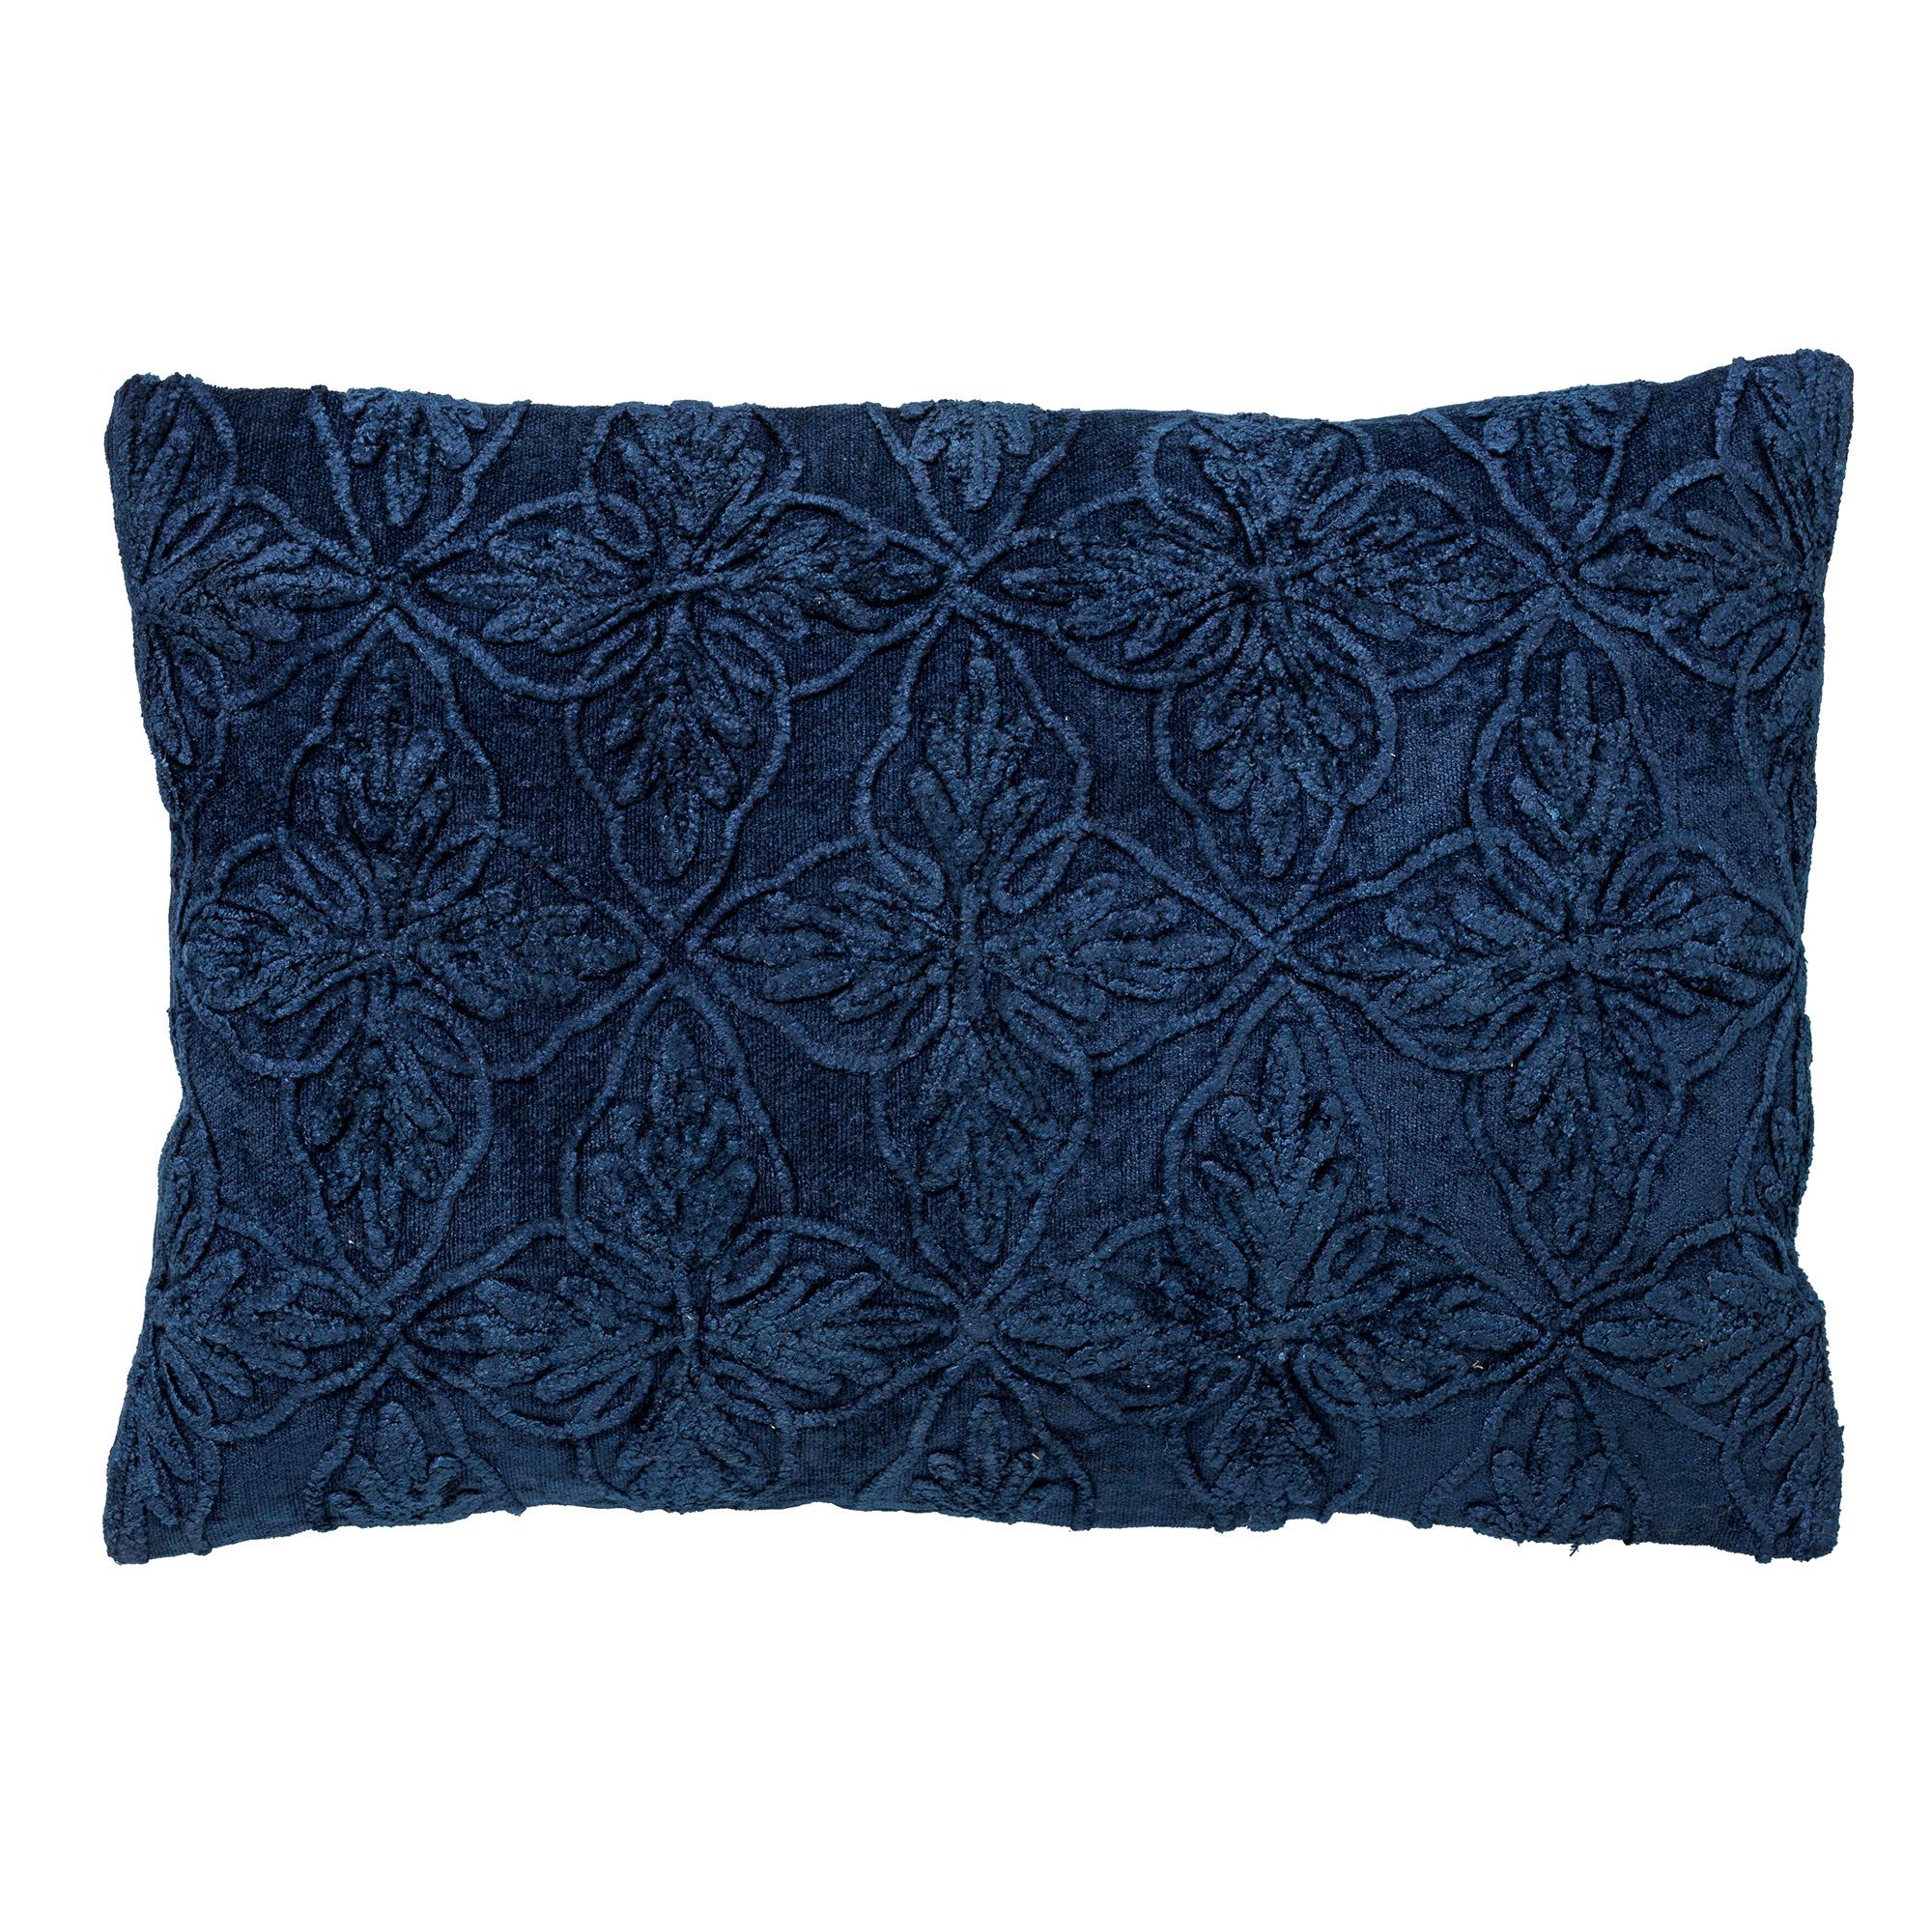 AMAR - Sierkussen van katoen 40x60 cm Insignia Blue